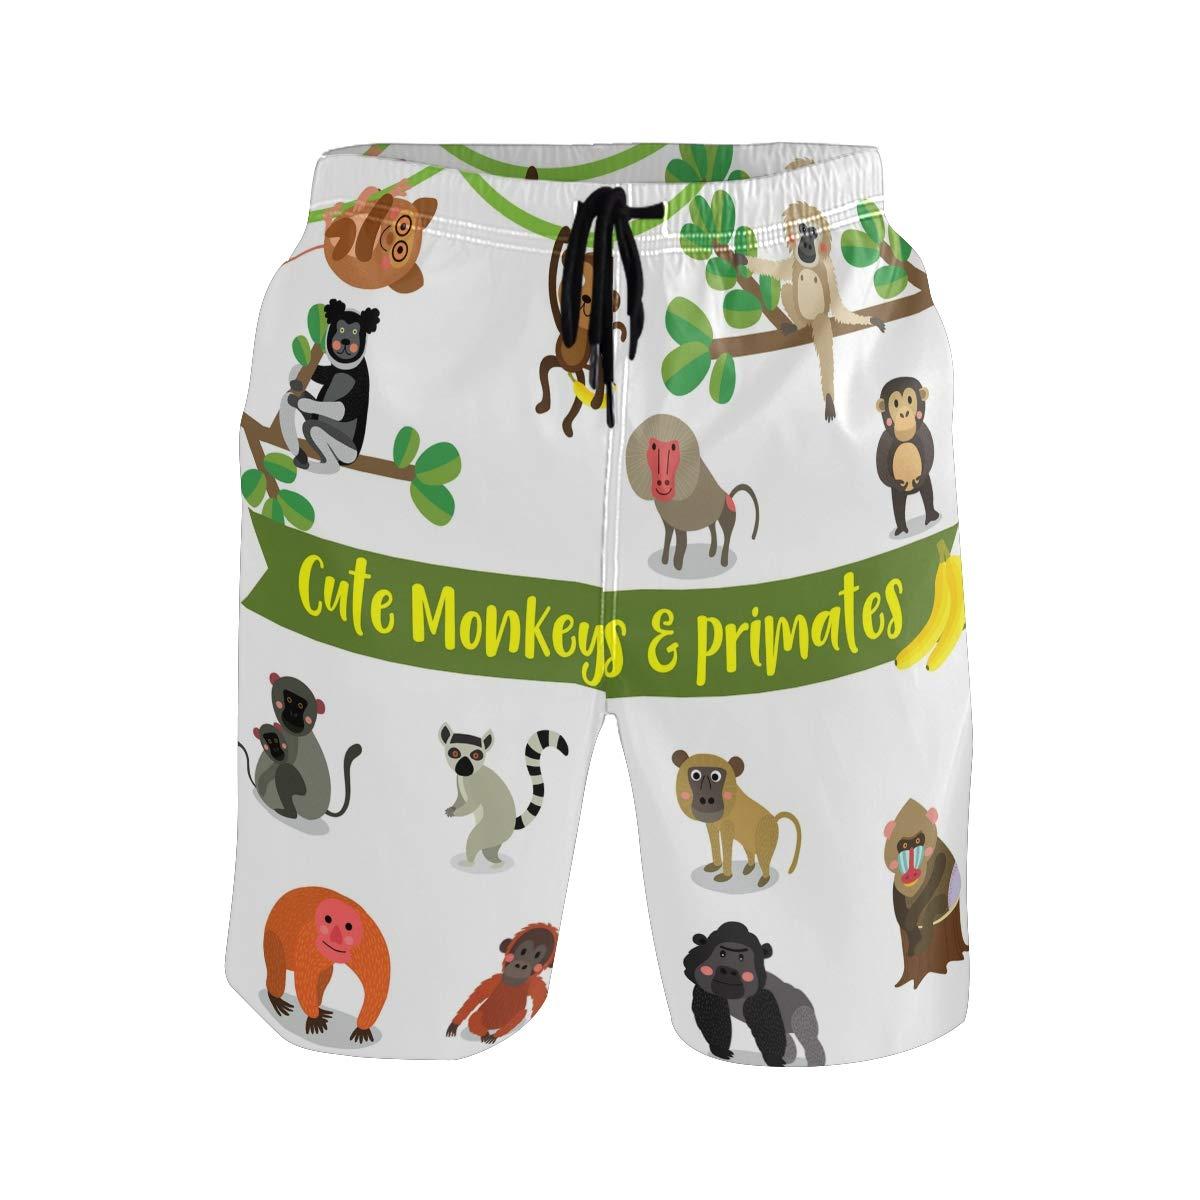 WIHVE Mens Beach Swim Trunks Cartoon Cute Monkey Primates Tree Branches Boxer Swimsuit Underwear Board Shorts with Pocket